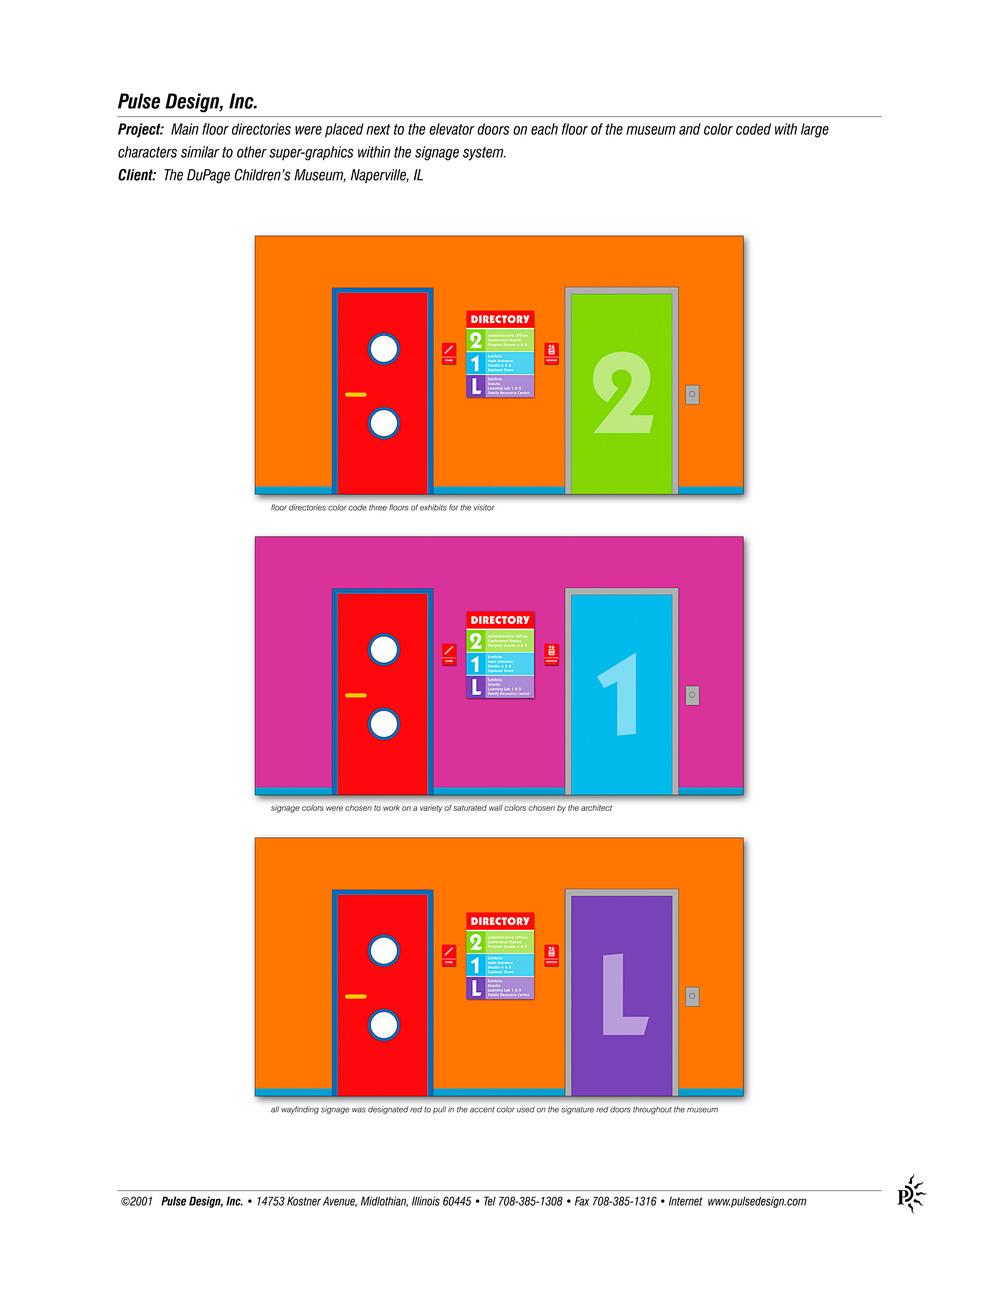 DCM-Wayfinding-Directory-Pulse-Design-Inc.jpg